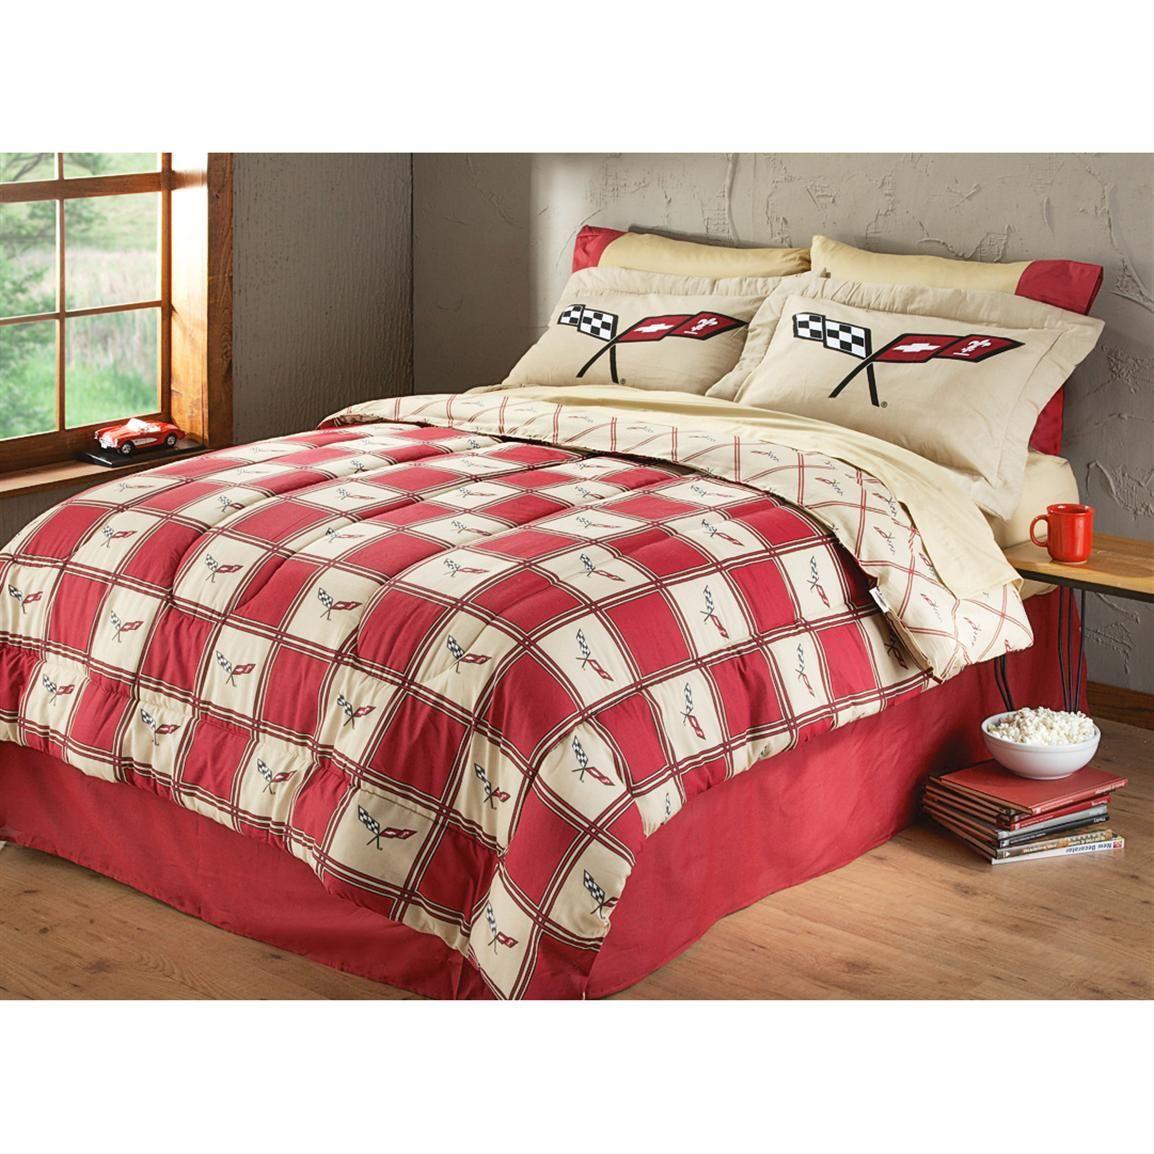 Corvette Bed Sheets